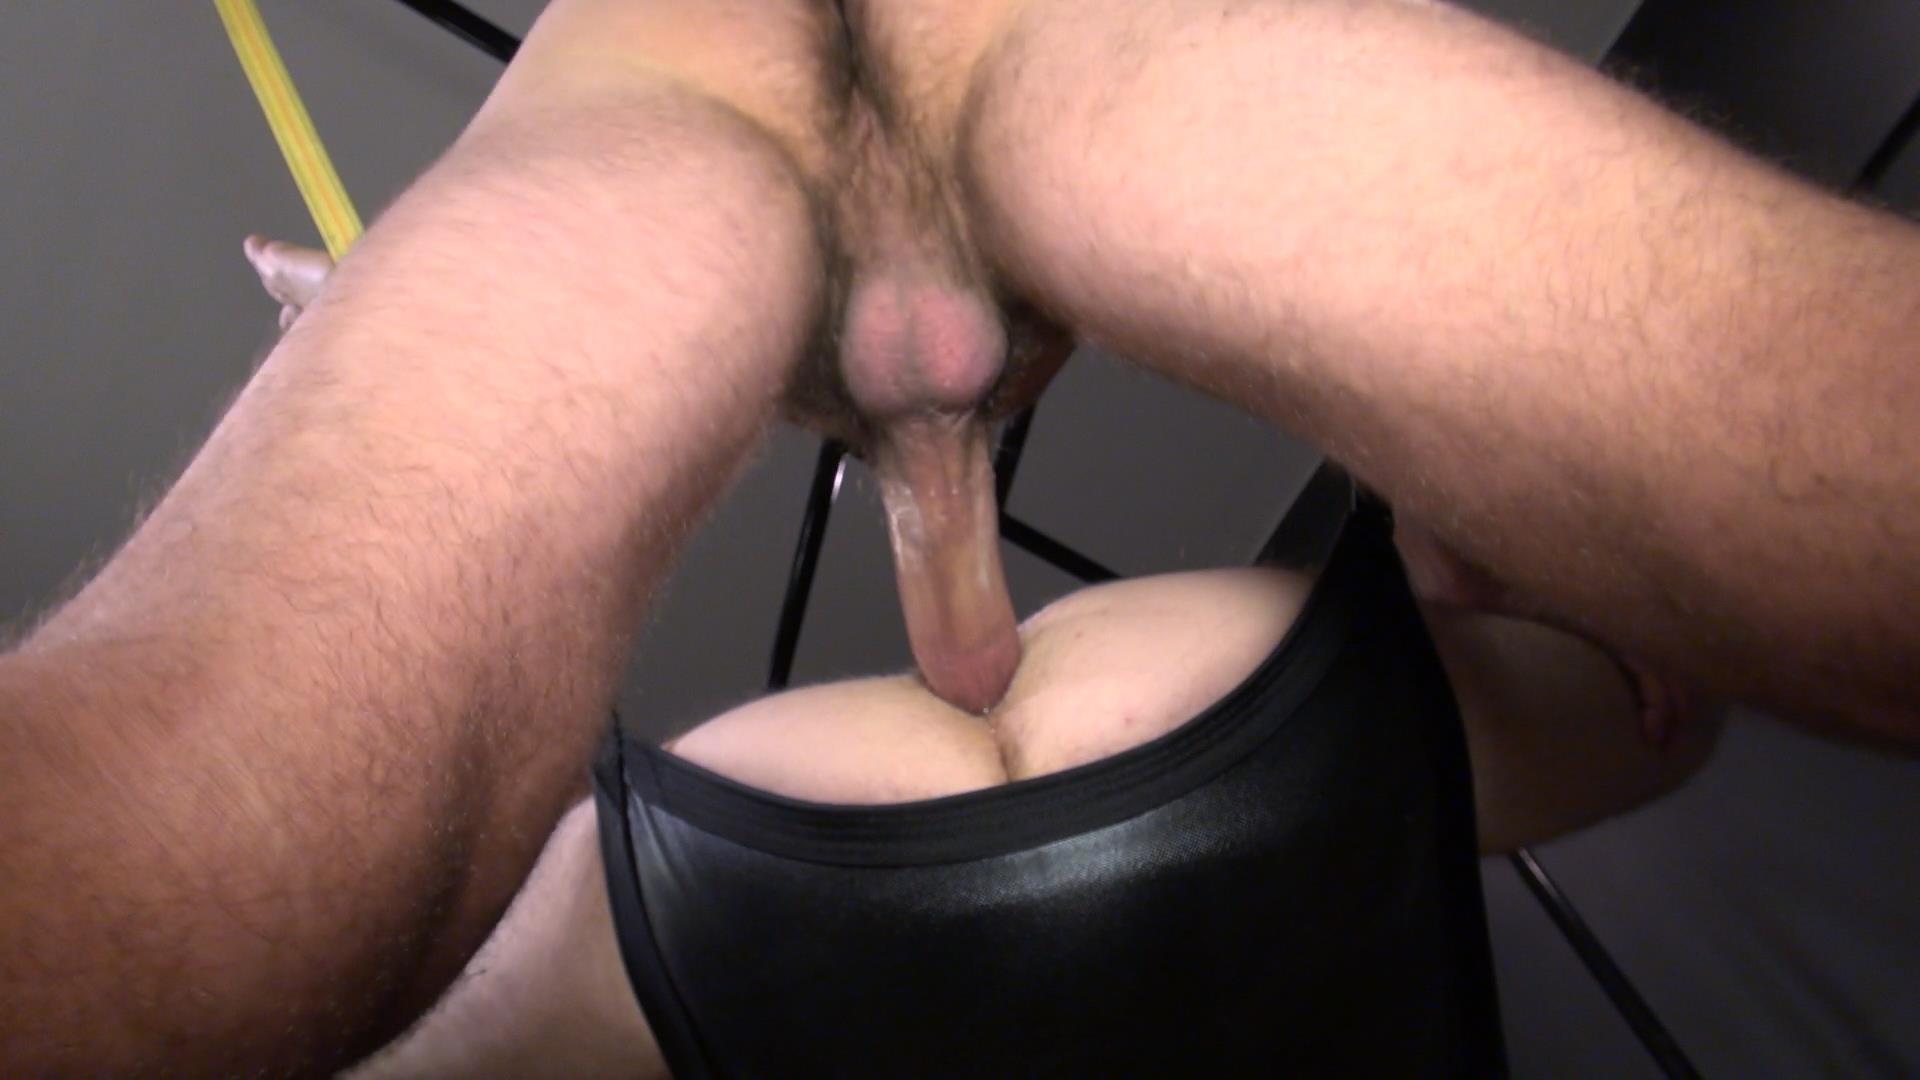 amature female sex videos with orgasm